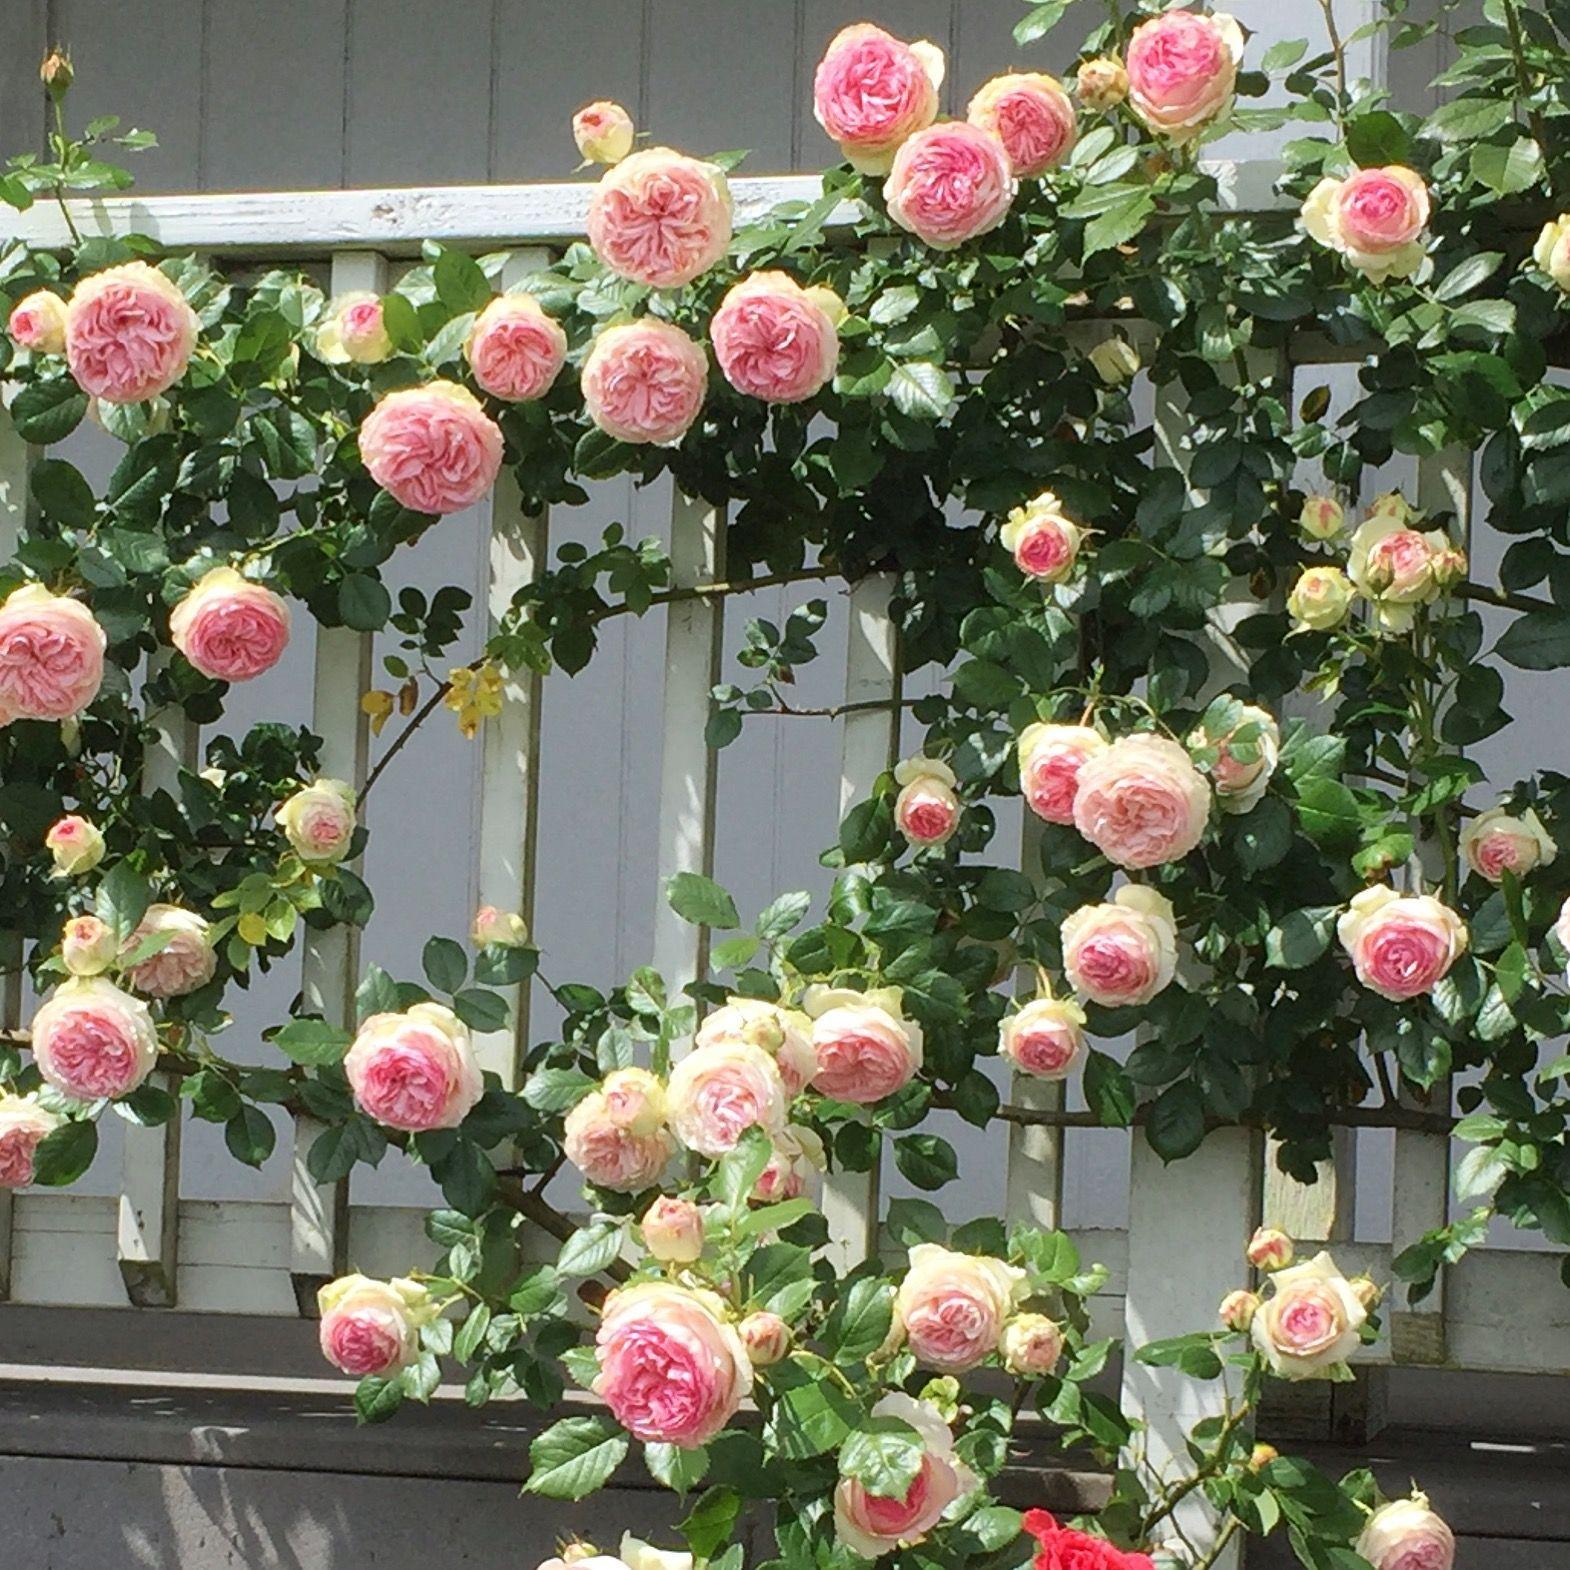 Heirloom Rose Garden In 2020 Rose Garden Design Climbing Roses Climbing Roses Trellis